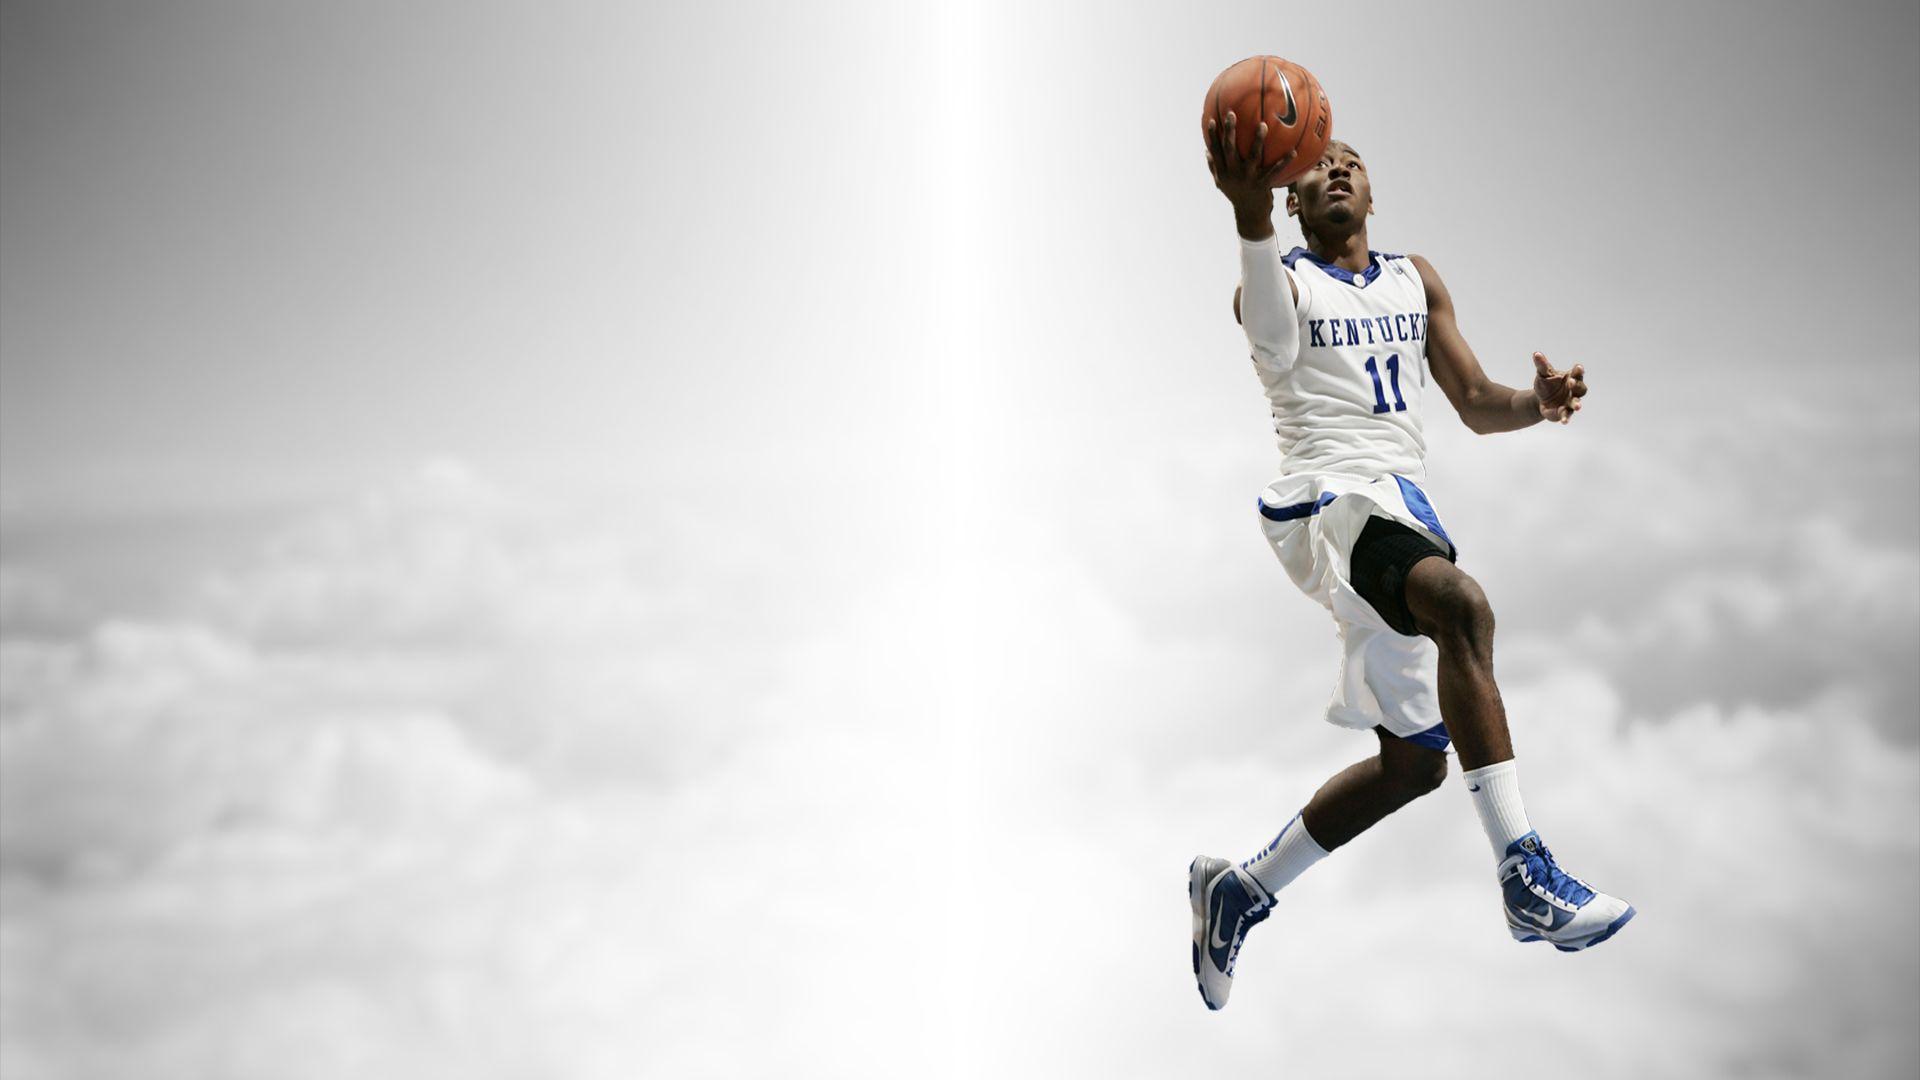 Kentucky Basketball image